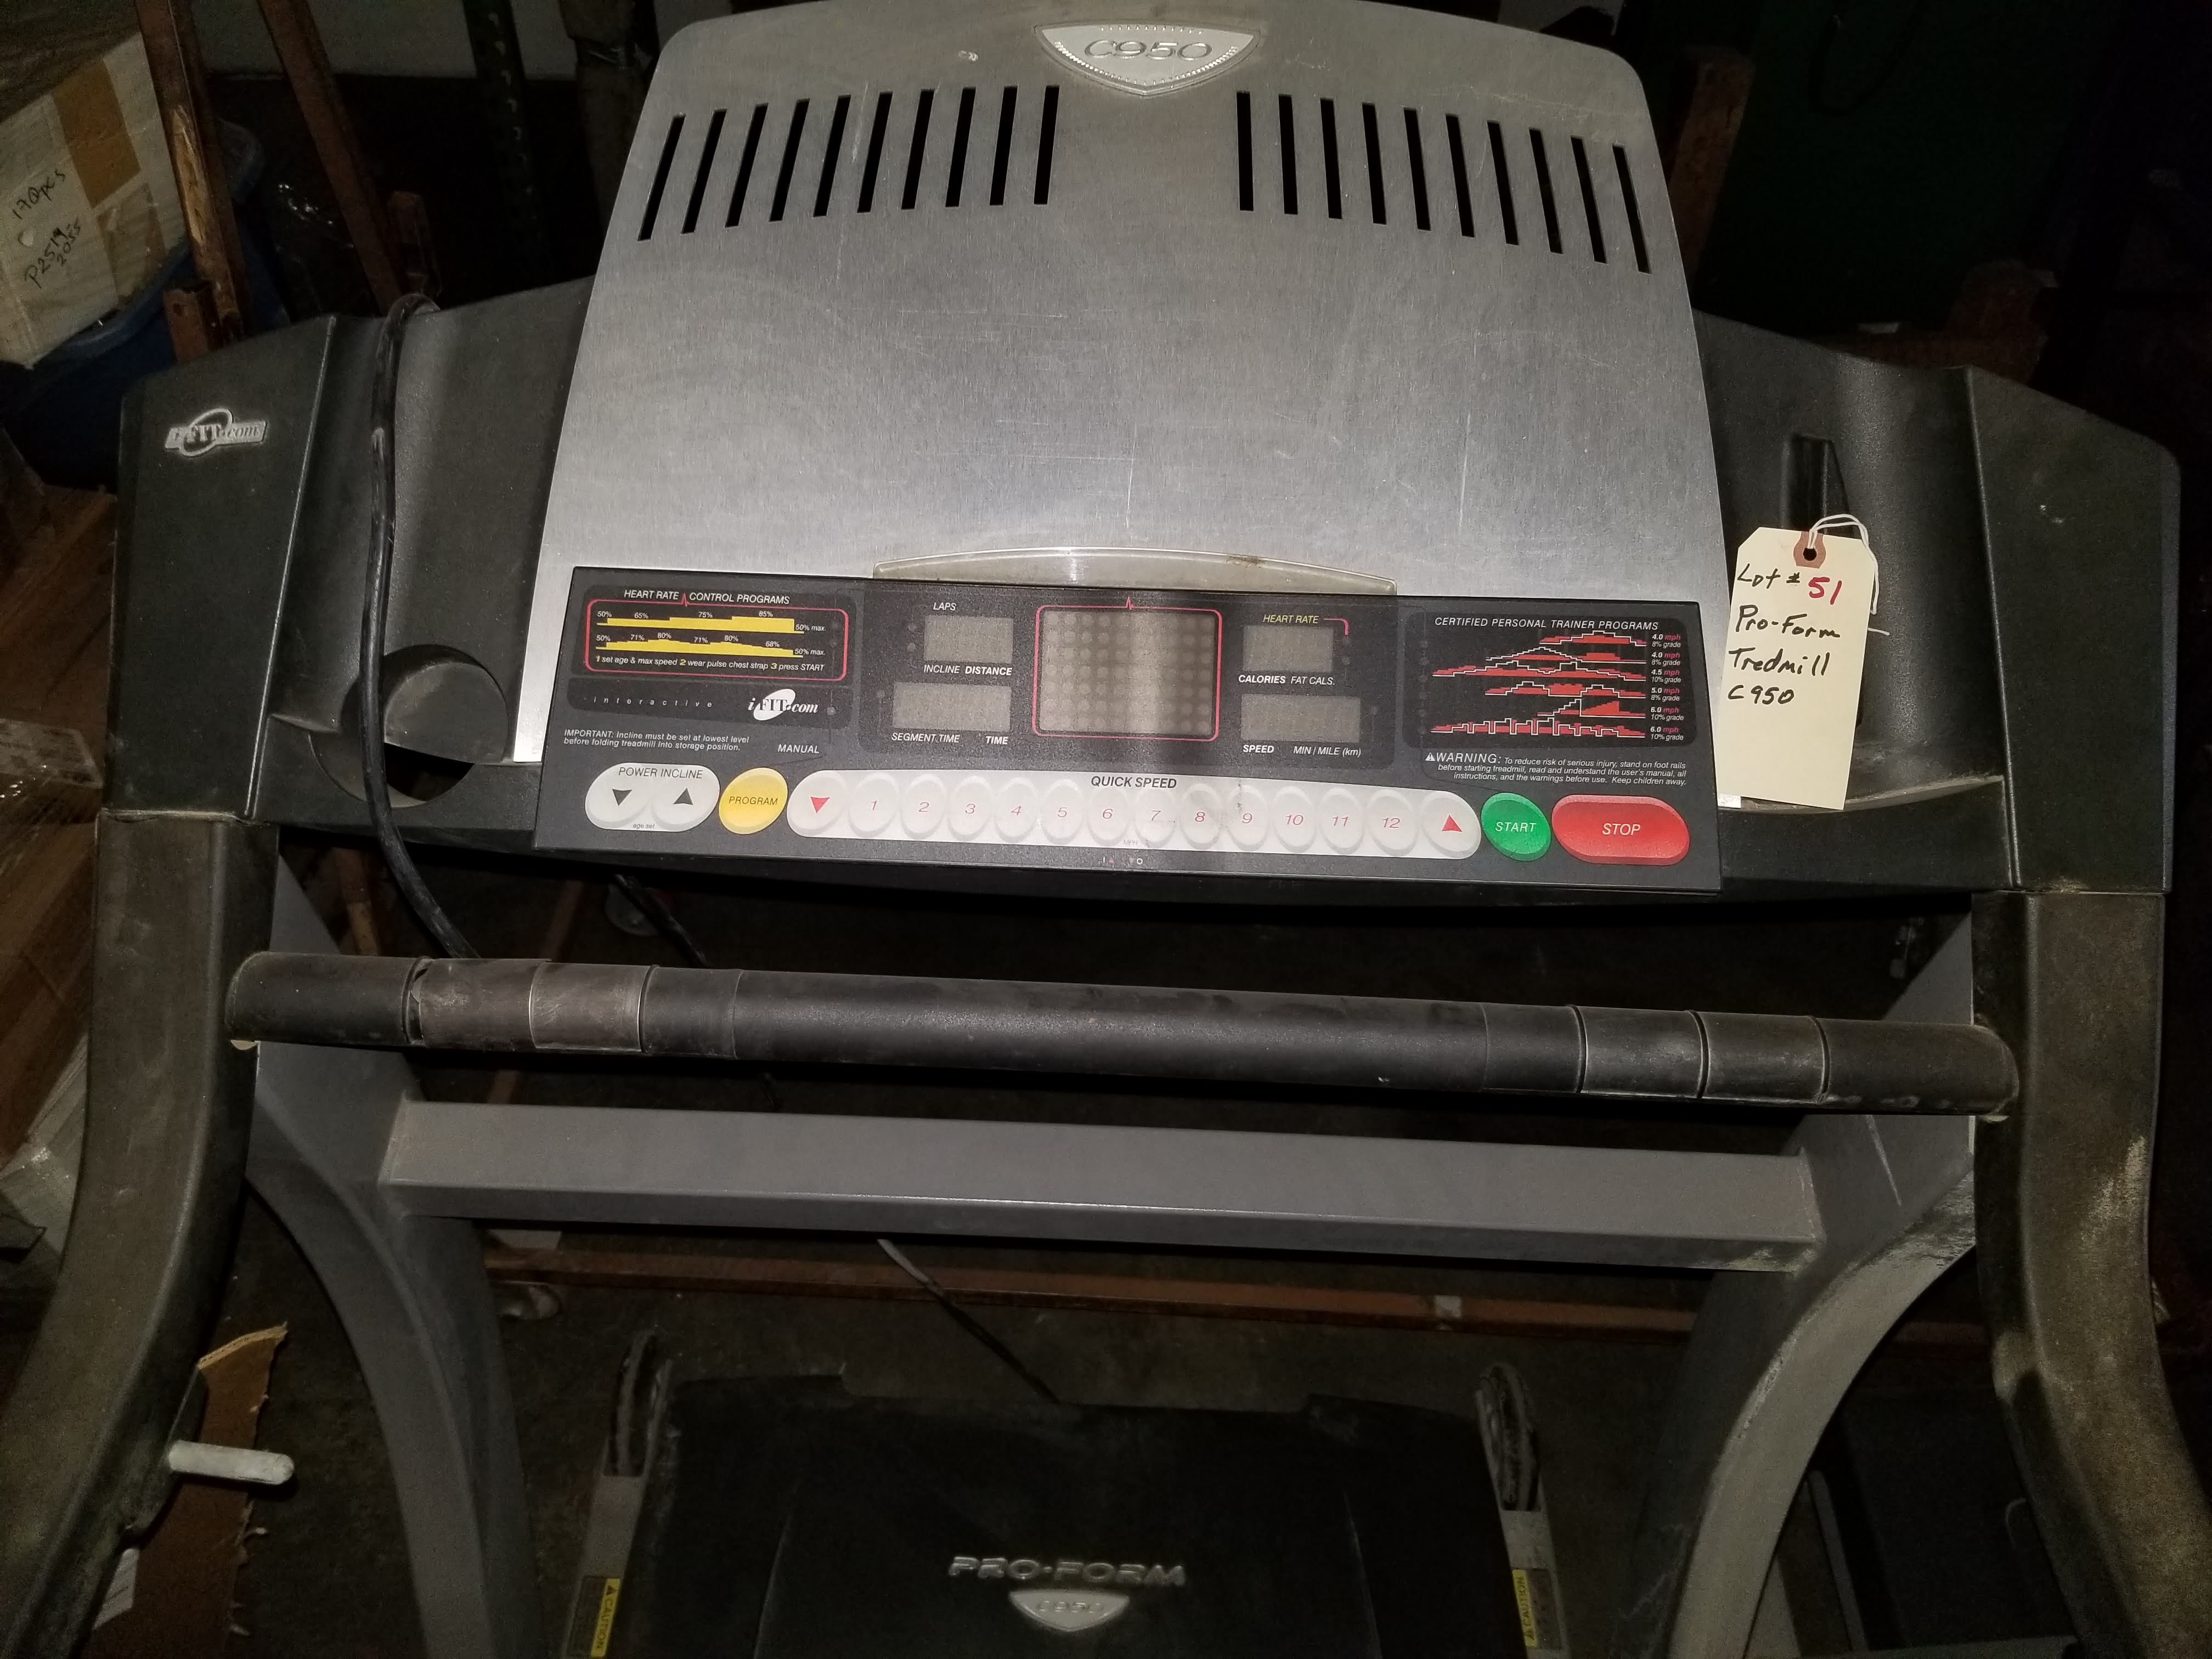 Pro-Form Tredmill C950 - Image 2 of 3